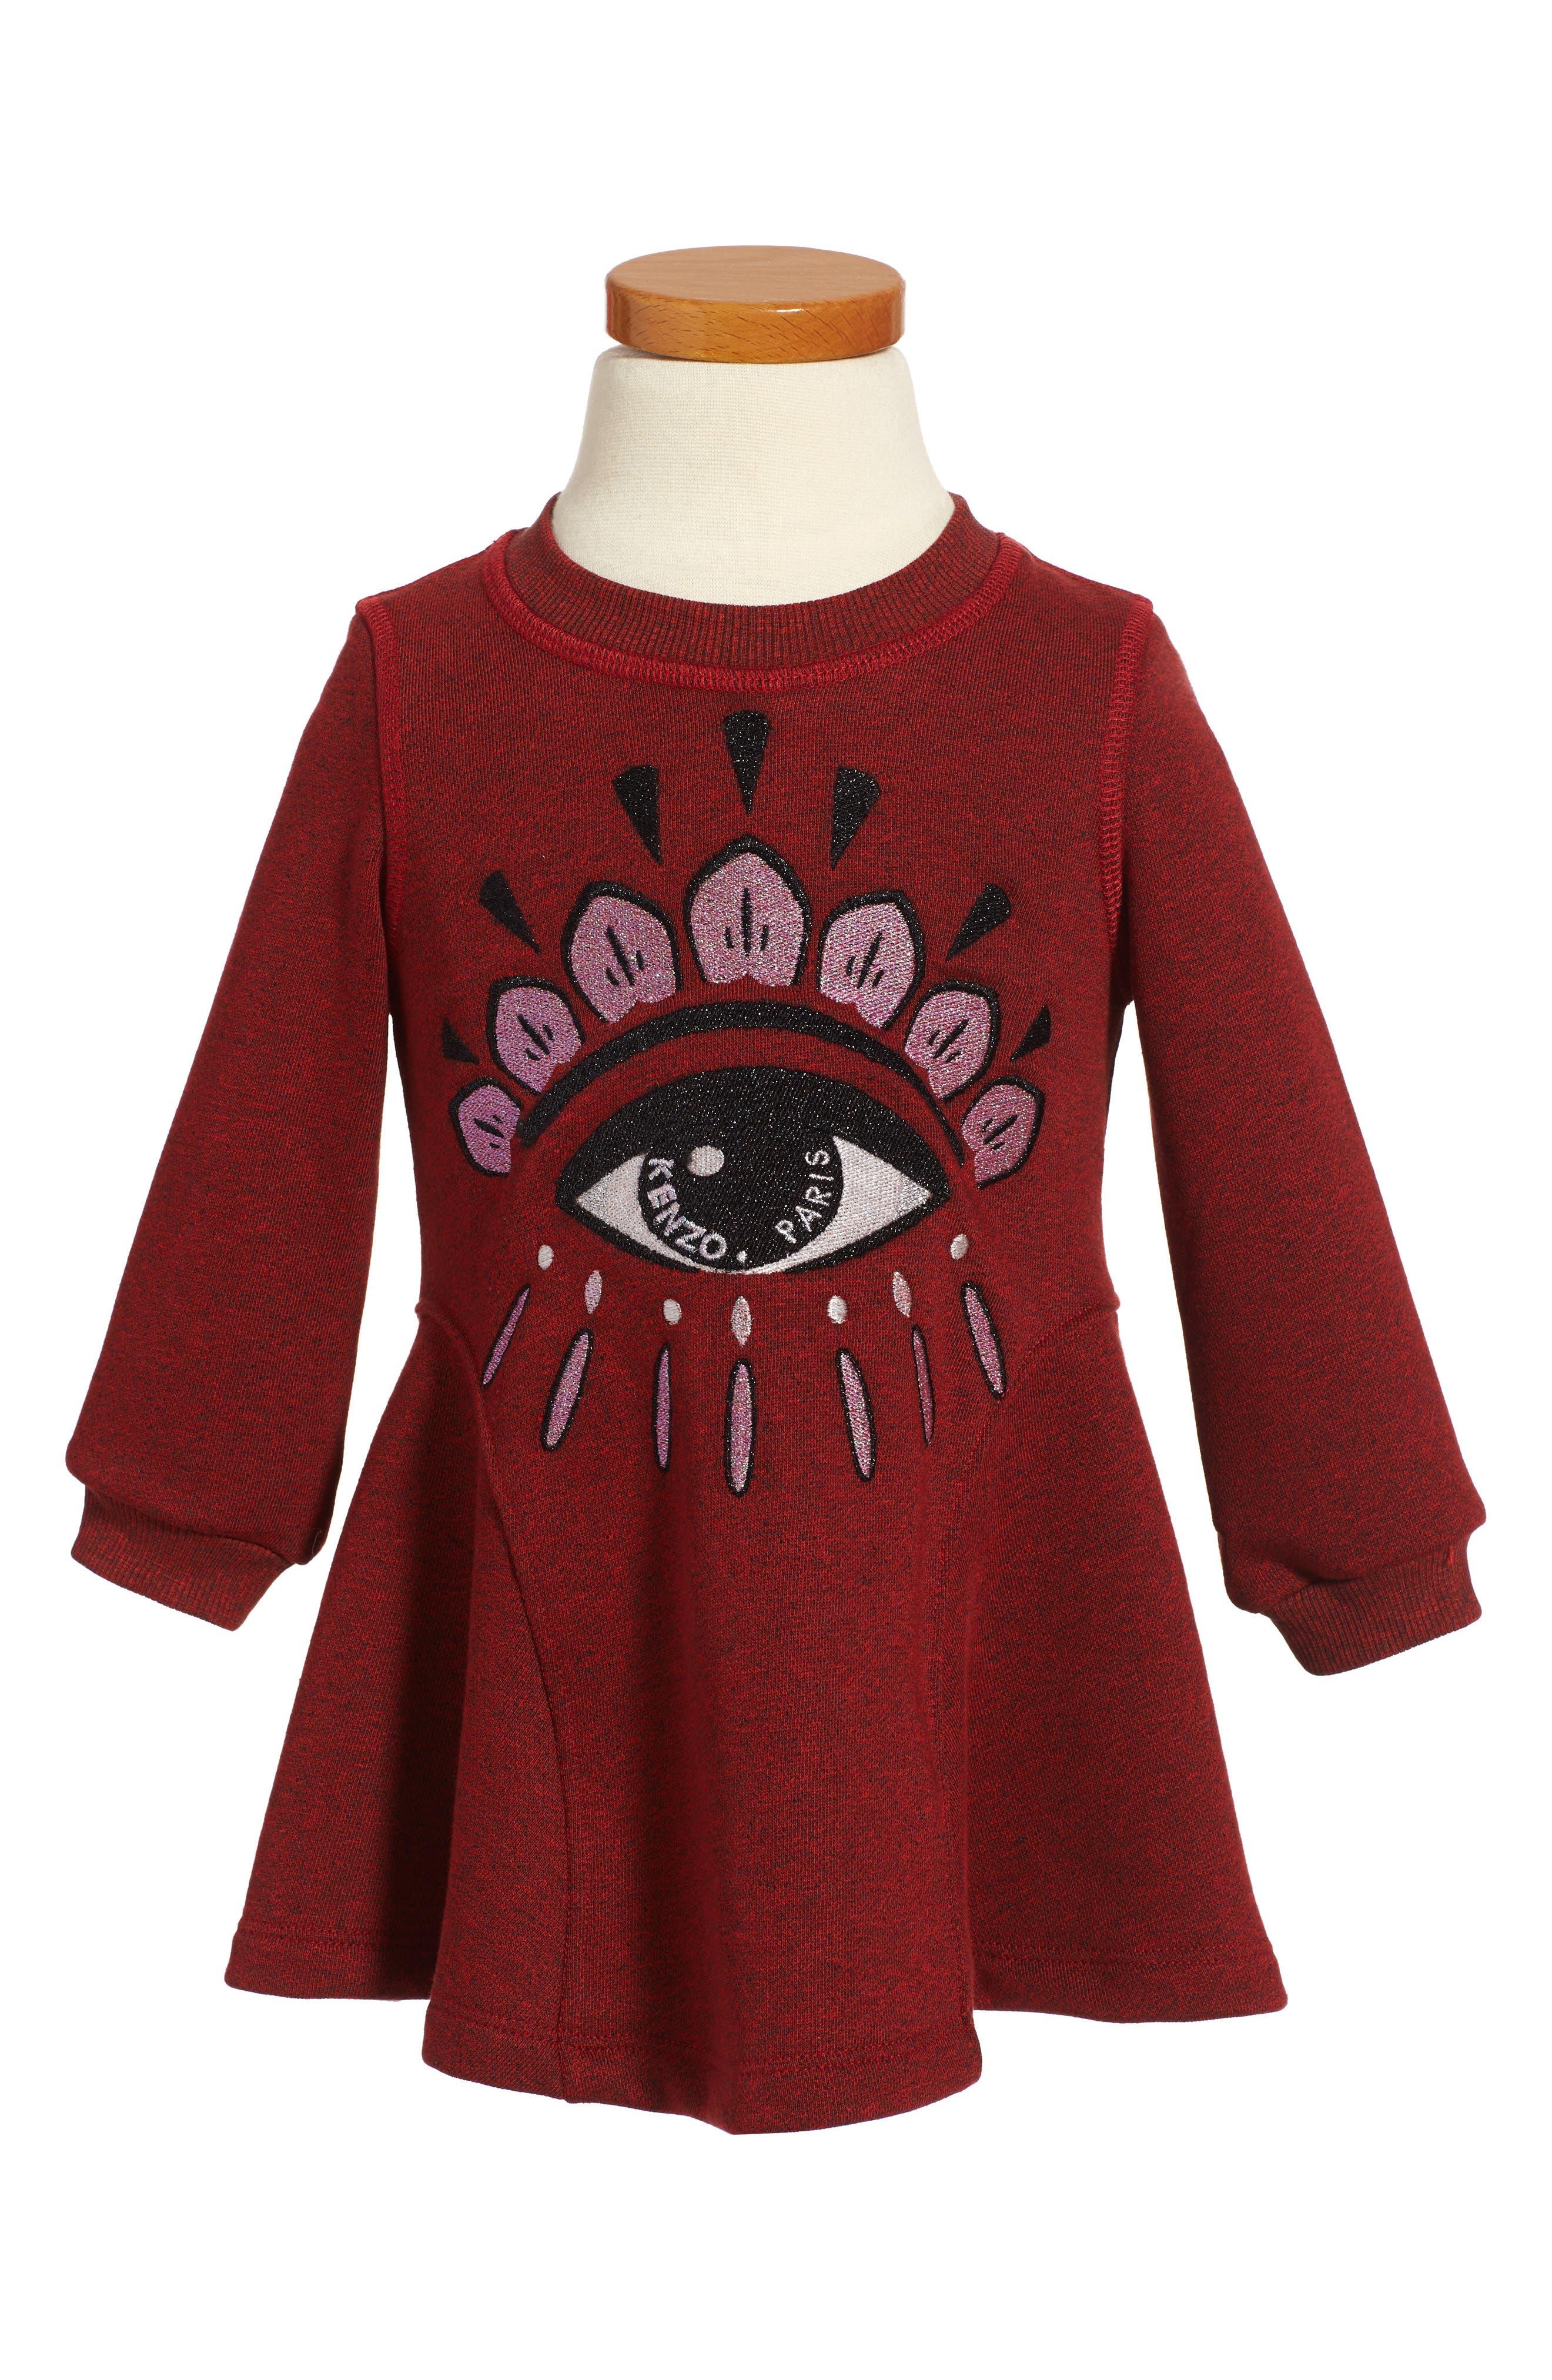 Main Image - KENZO Eye Graphic Tee (Toddler Girls, Little Girls & Big Girls)